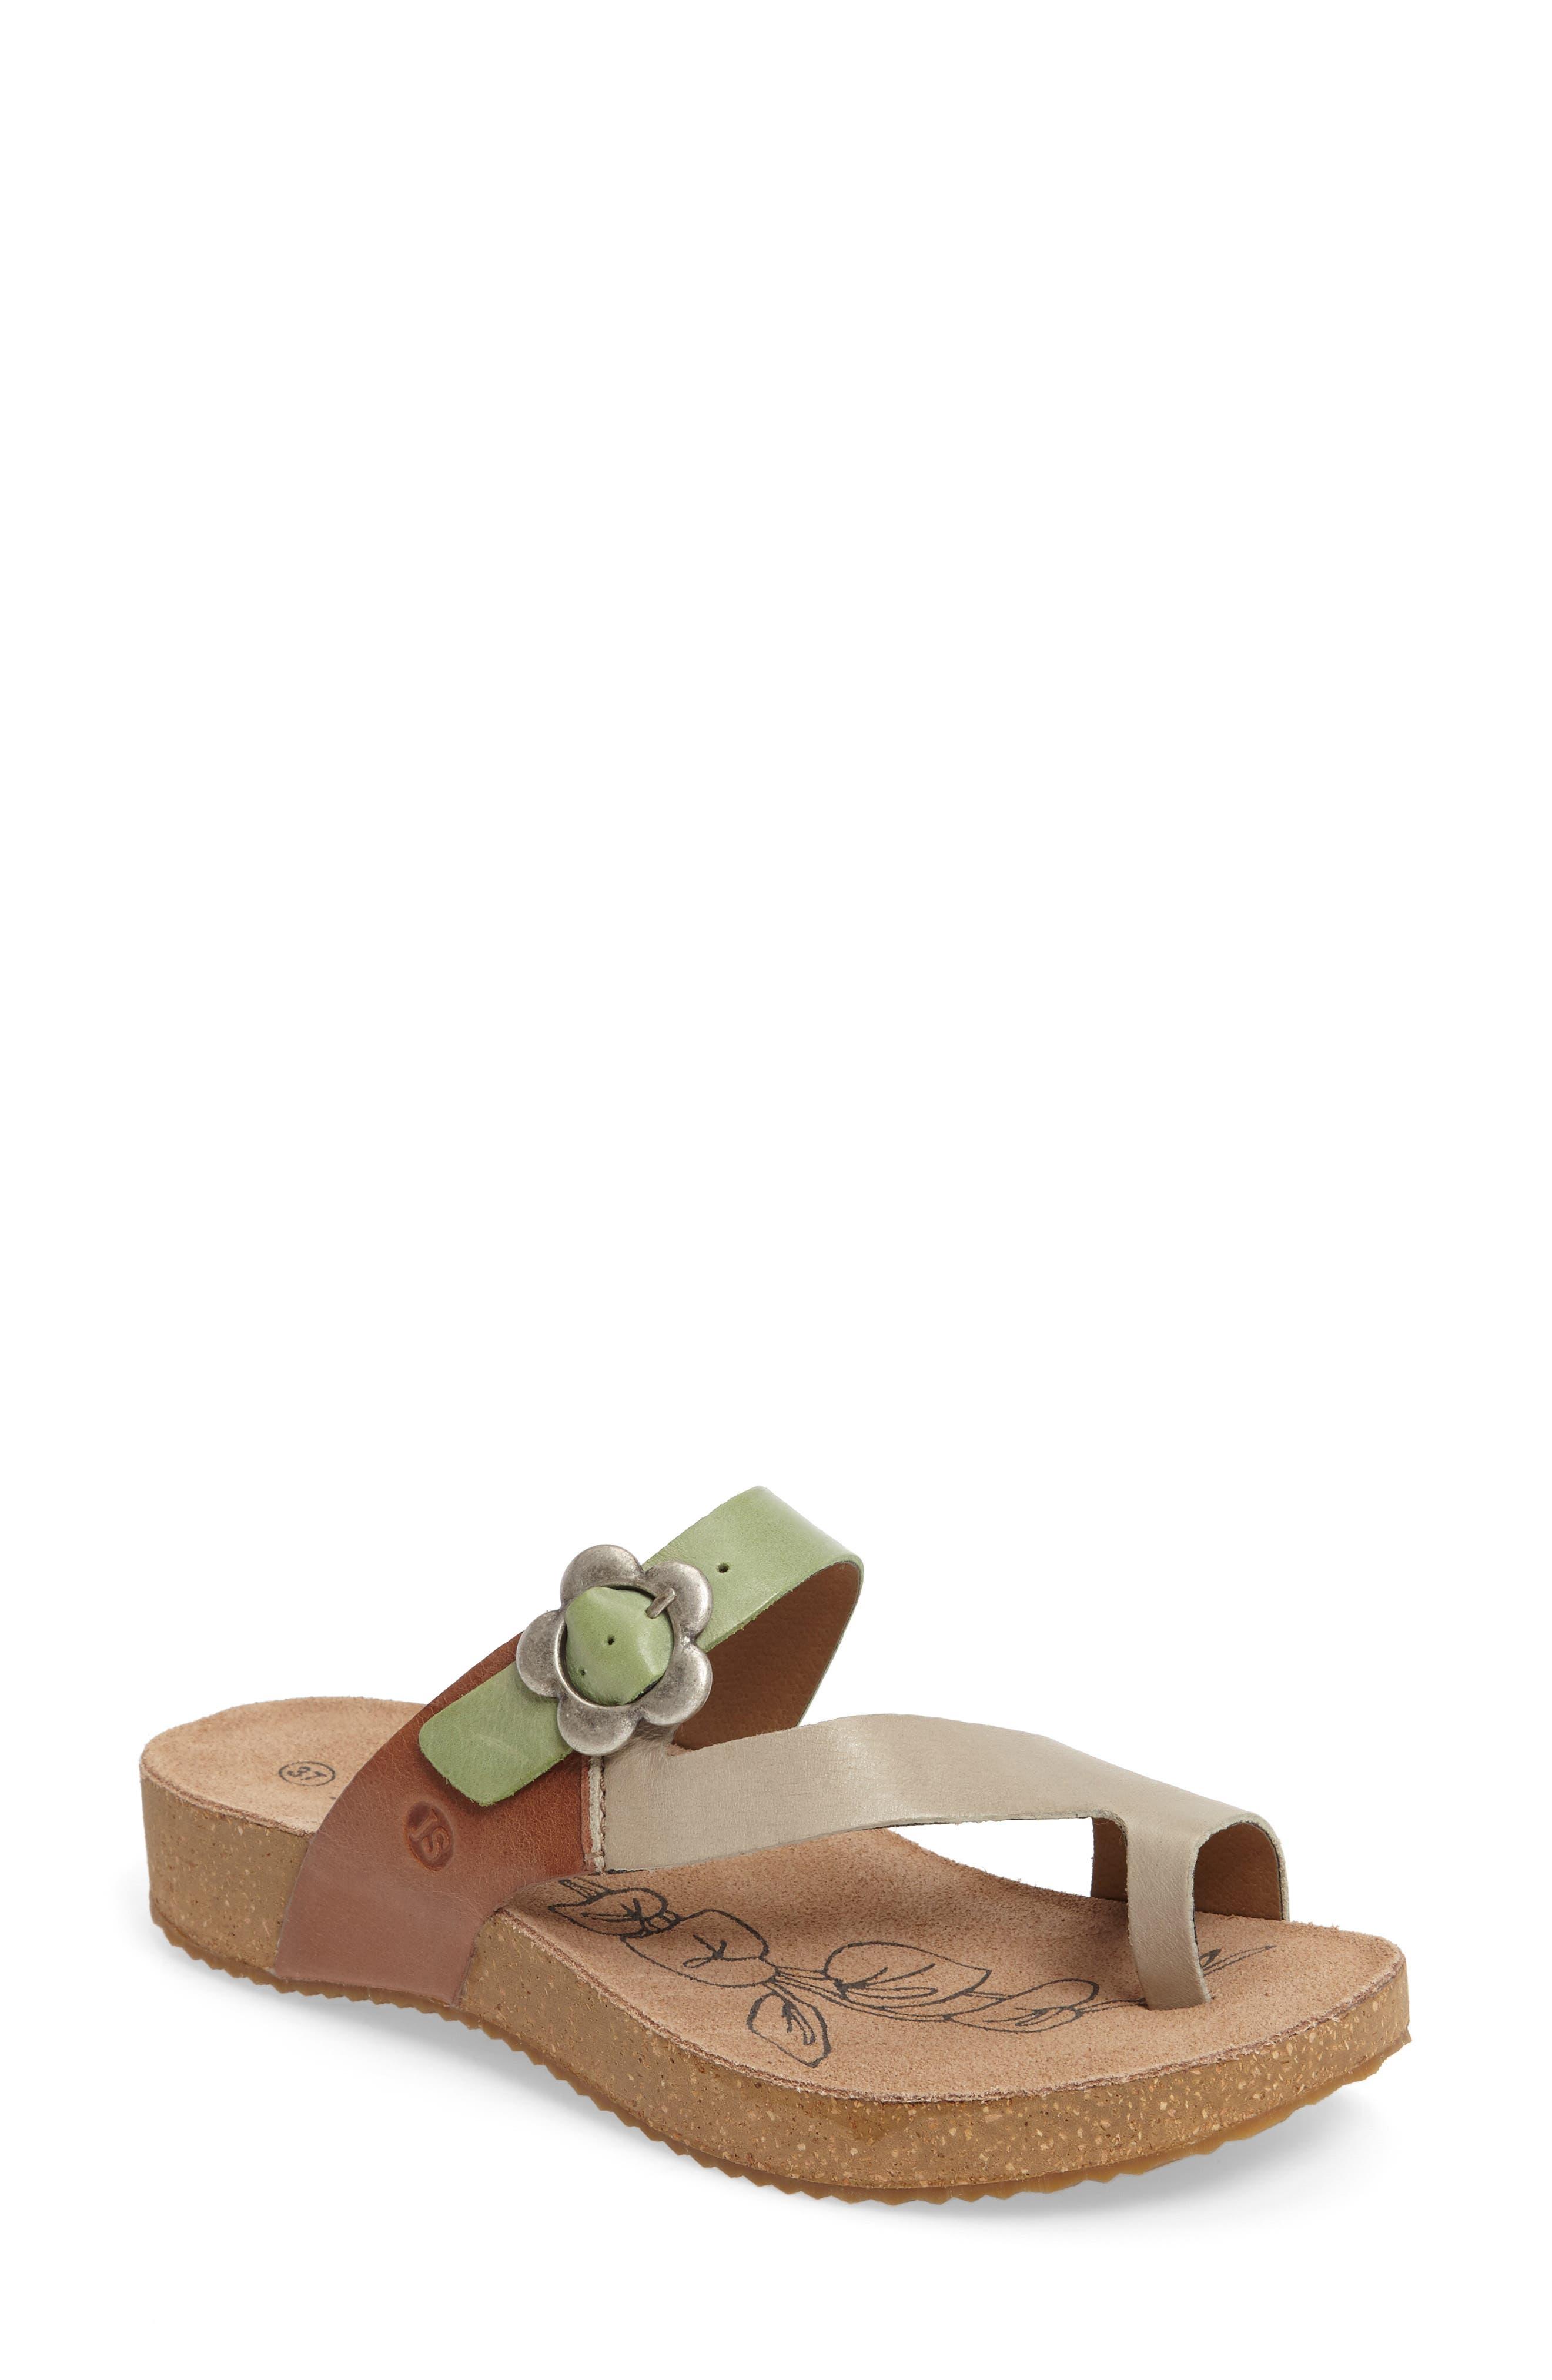 Tonga 23 Sandal,                         Main,                         color, Grey Multi Leather